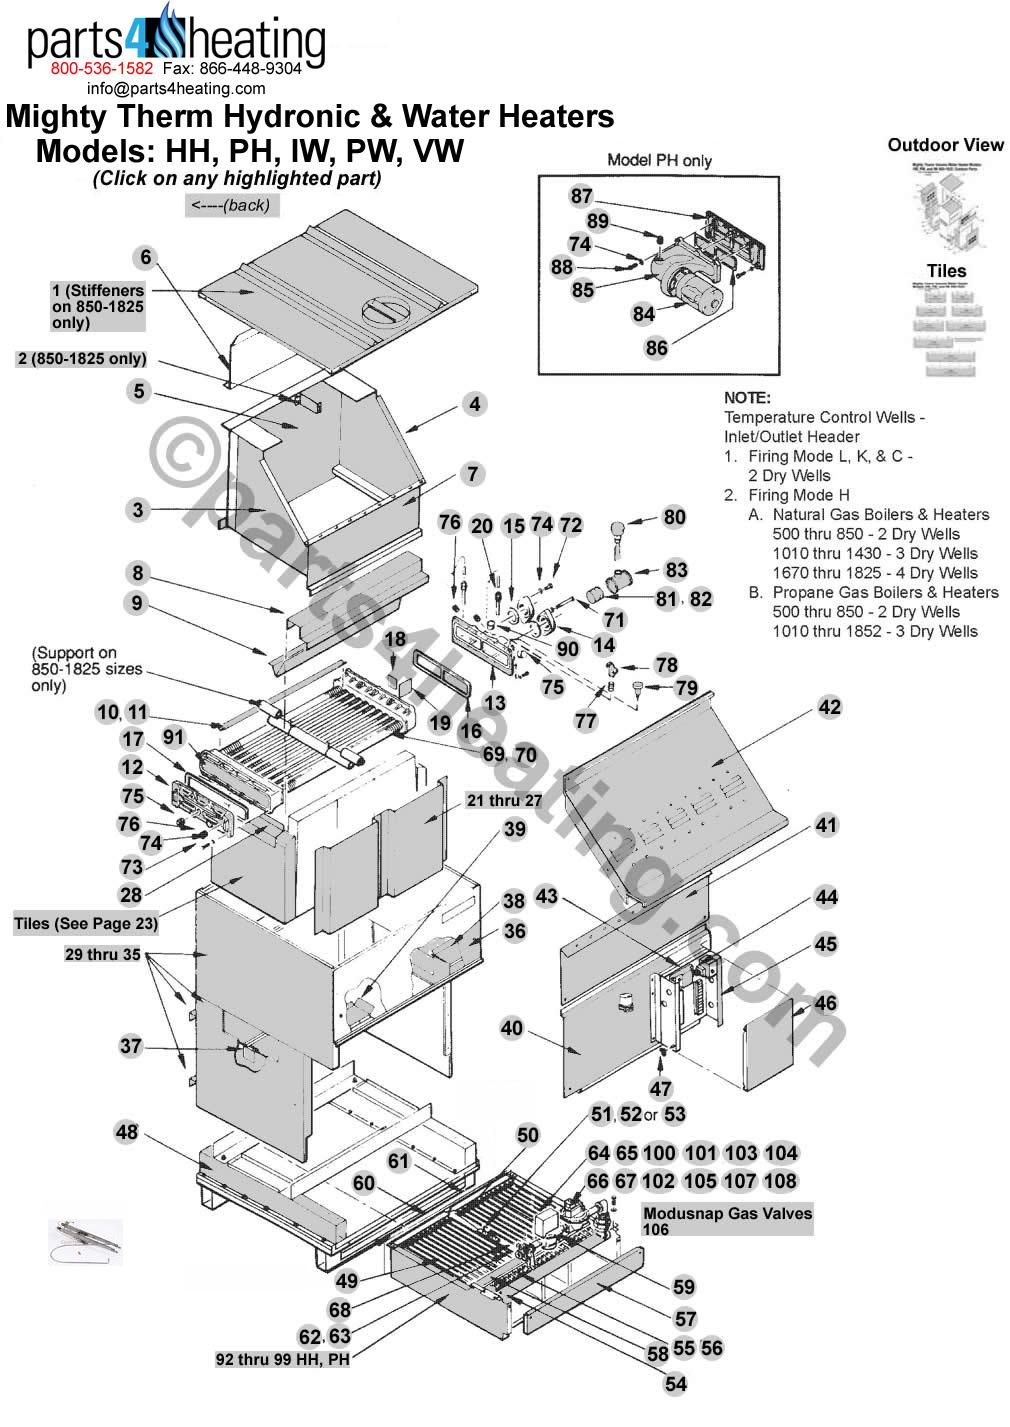 Honda Cg 125 Wiring Diagram Pdf besides 1974 Honda Xl 125 Wiring Diagram in addition Honda Cdi Wiring besides Wiring Diagram Of Motorcycle Honda Xrm 125 together with Yamaha Ty 175 Parts Diagram Html. on honda cg 125 cdi wiring diagram